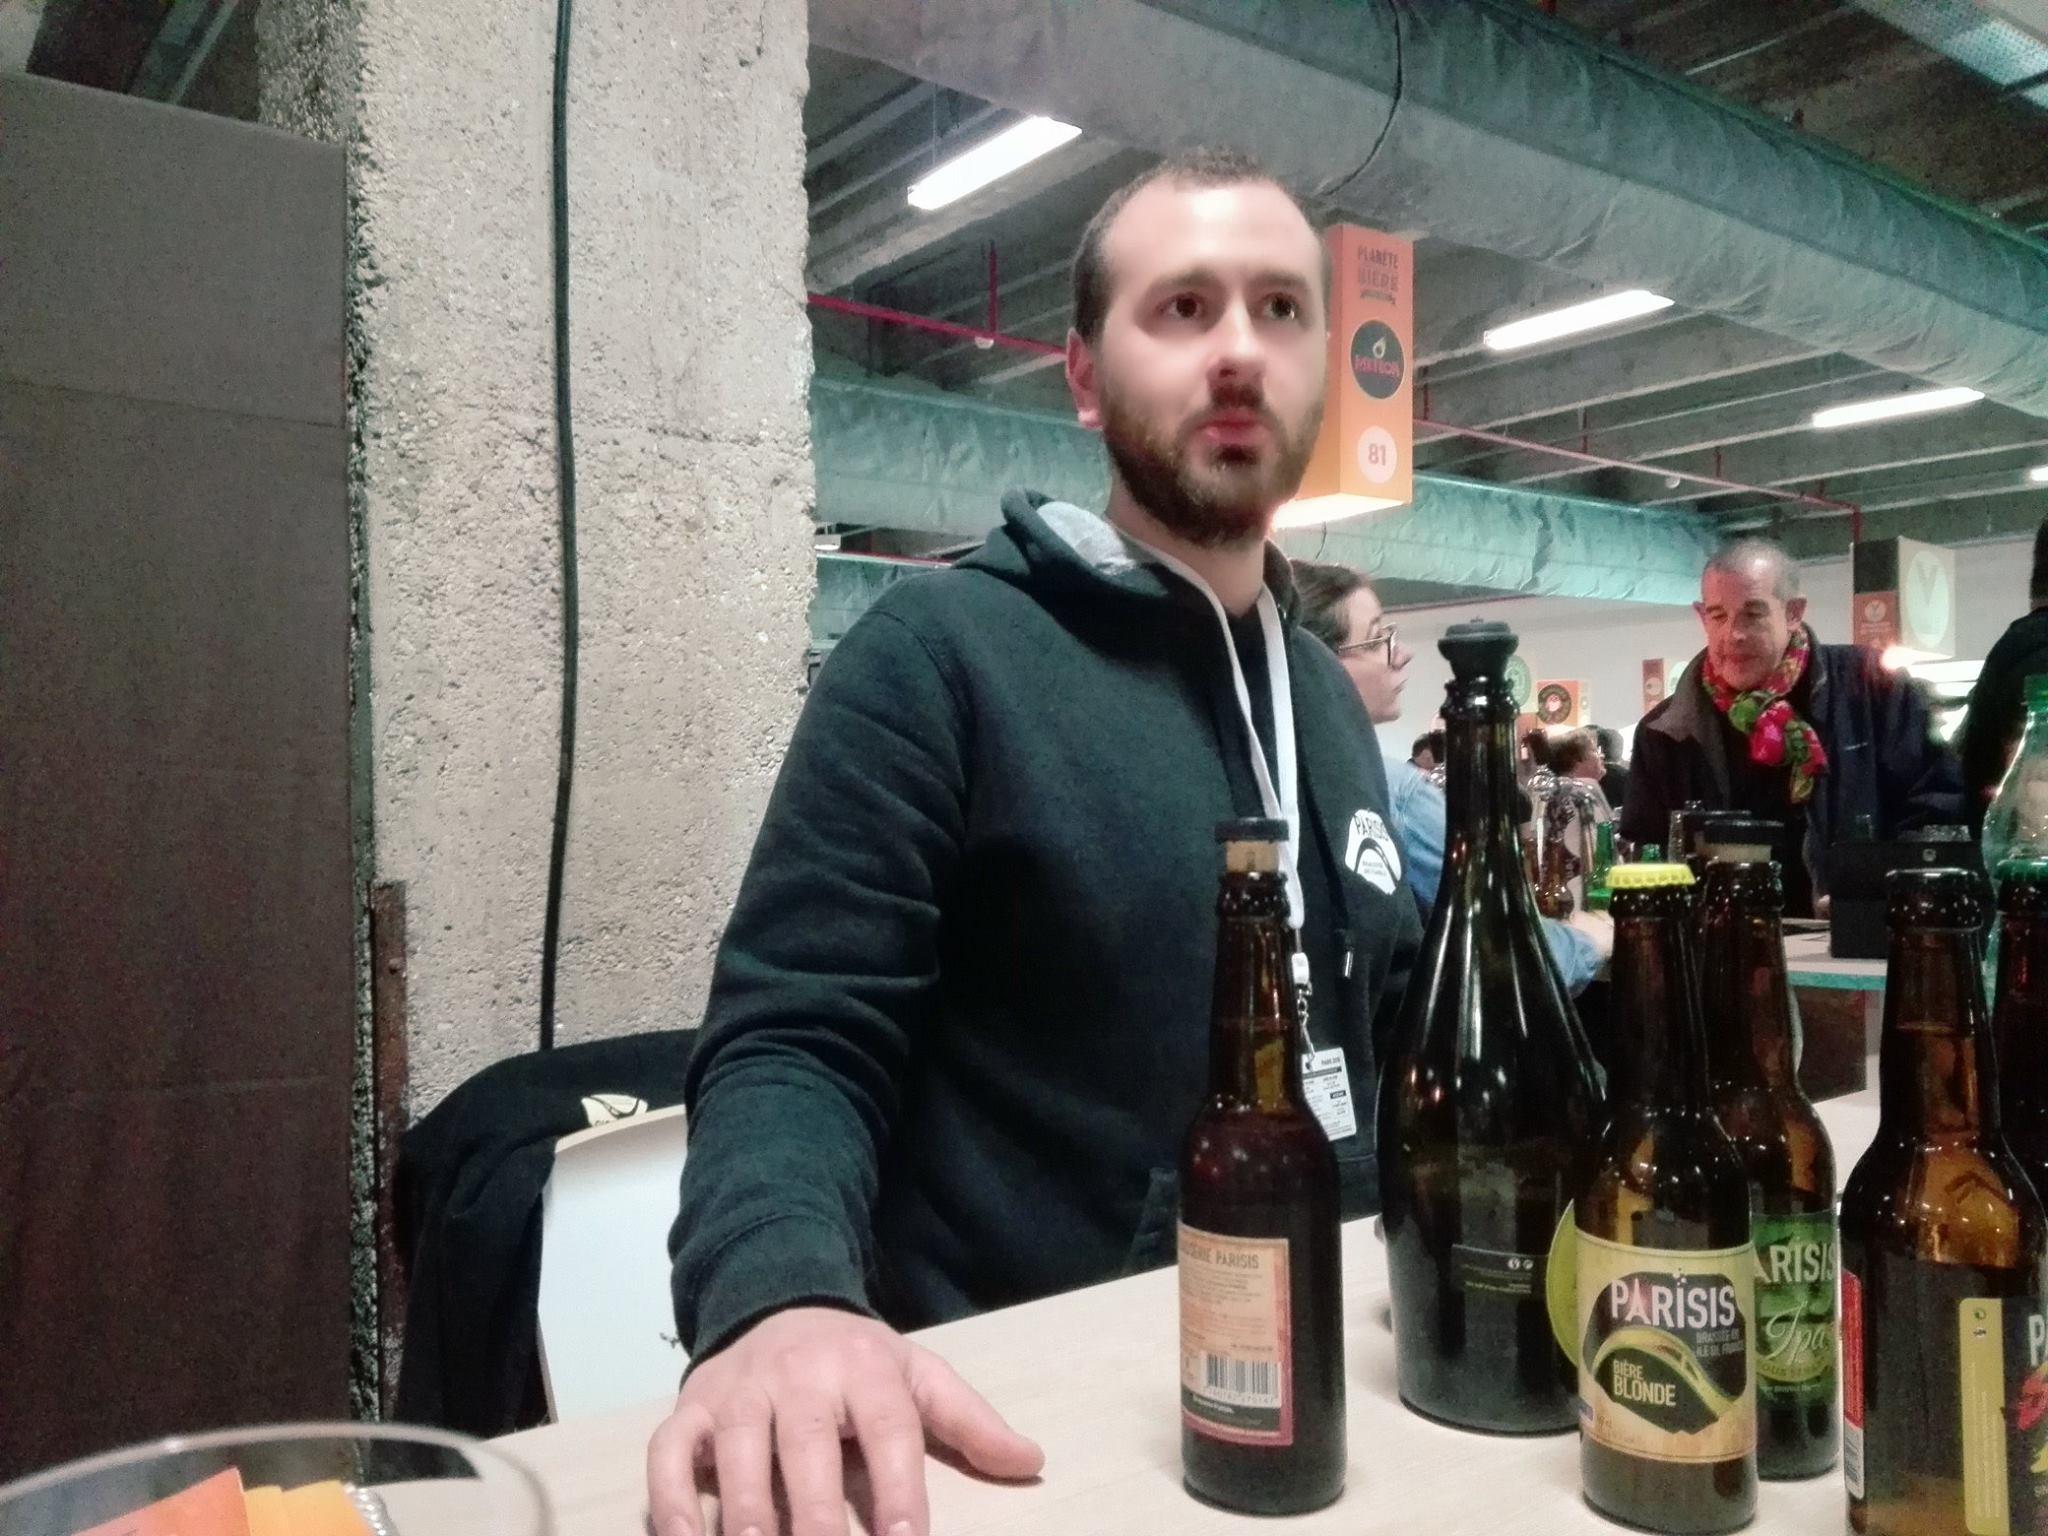 Jonathan Abergel (Parisis) - Planète Bière 2018